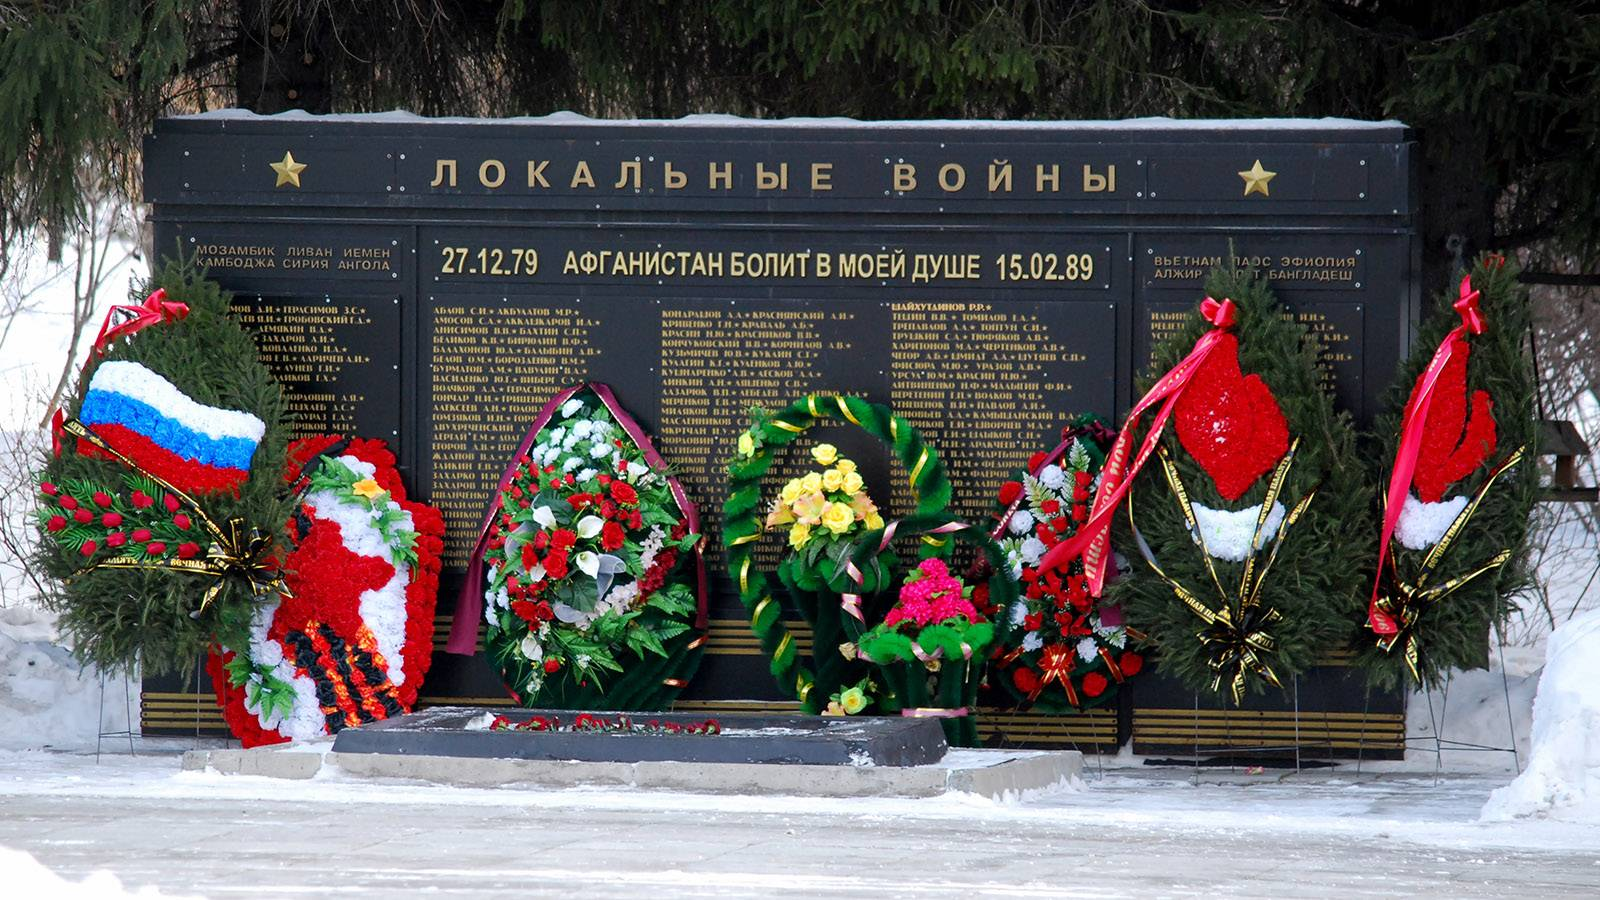 Мемориал погибшим воинам-интернационалистам. Новосибирск